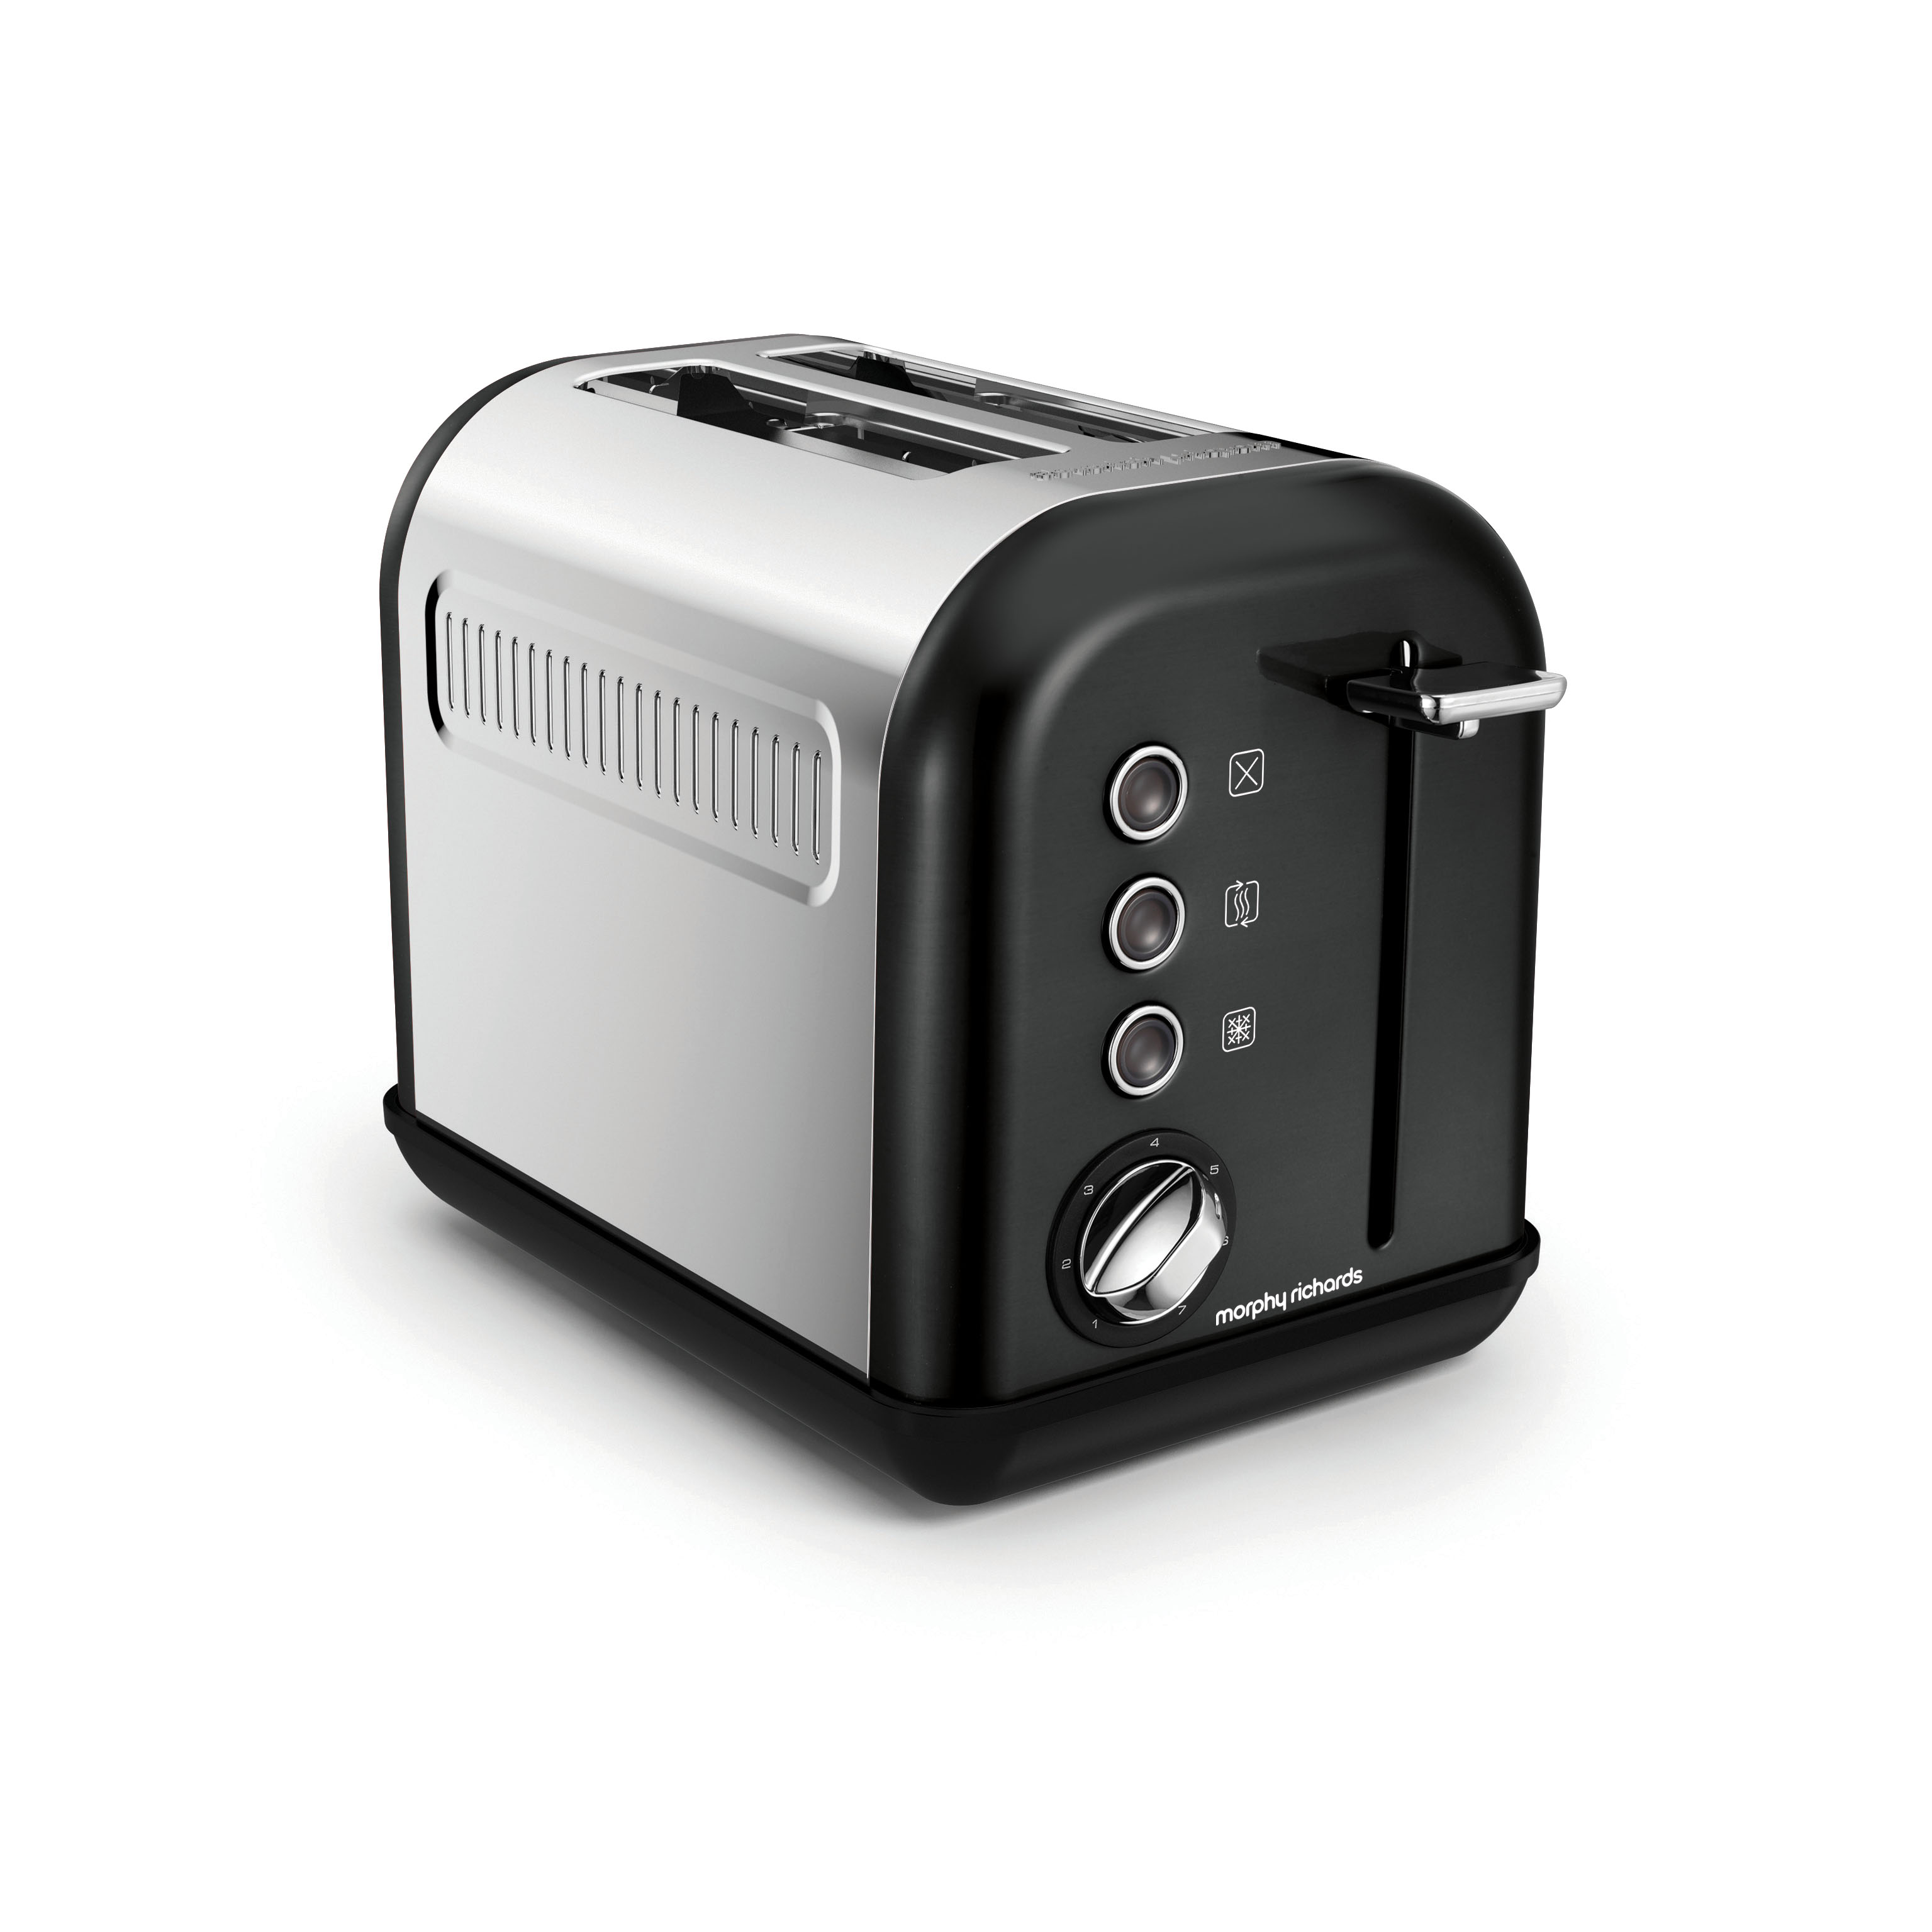 Morphy Richards Hero 2-slice toaster, sort